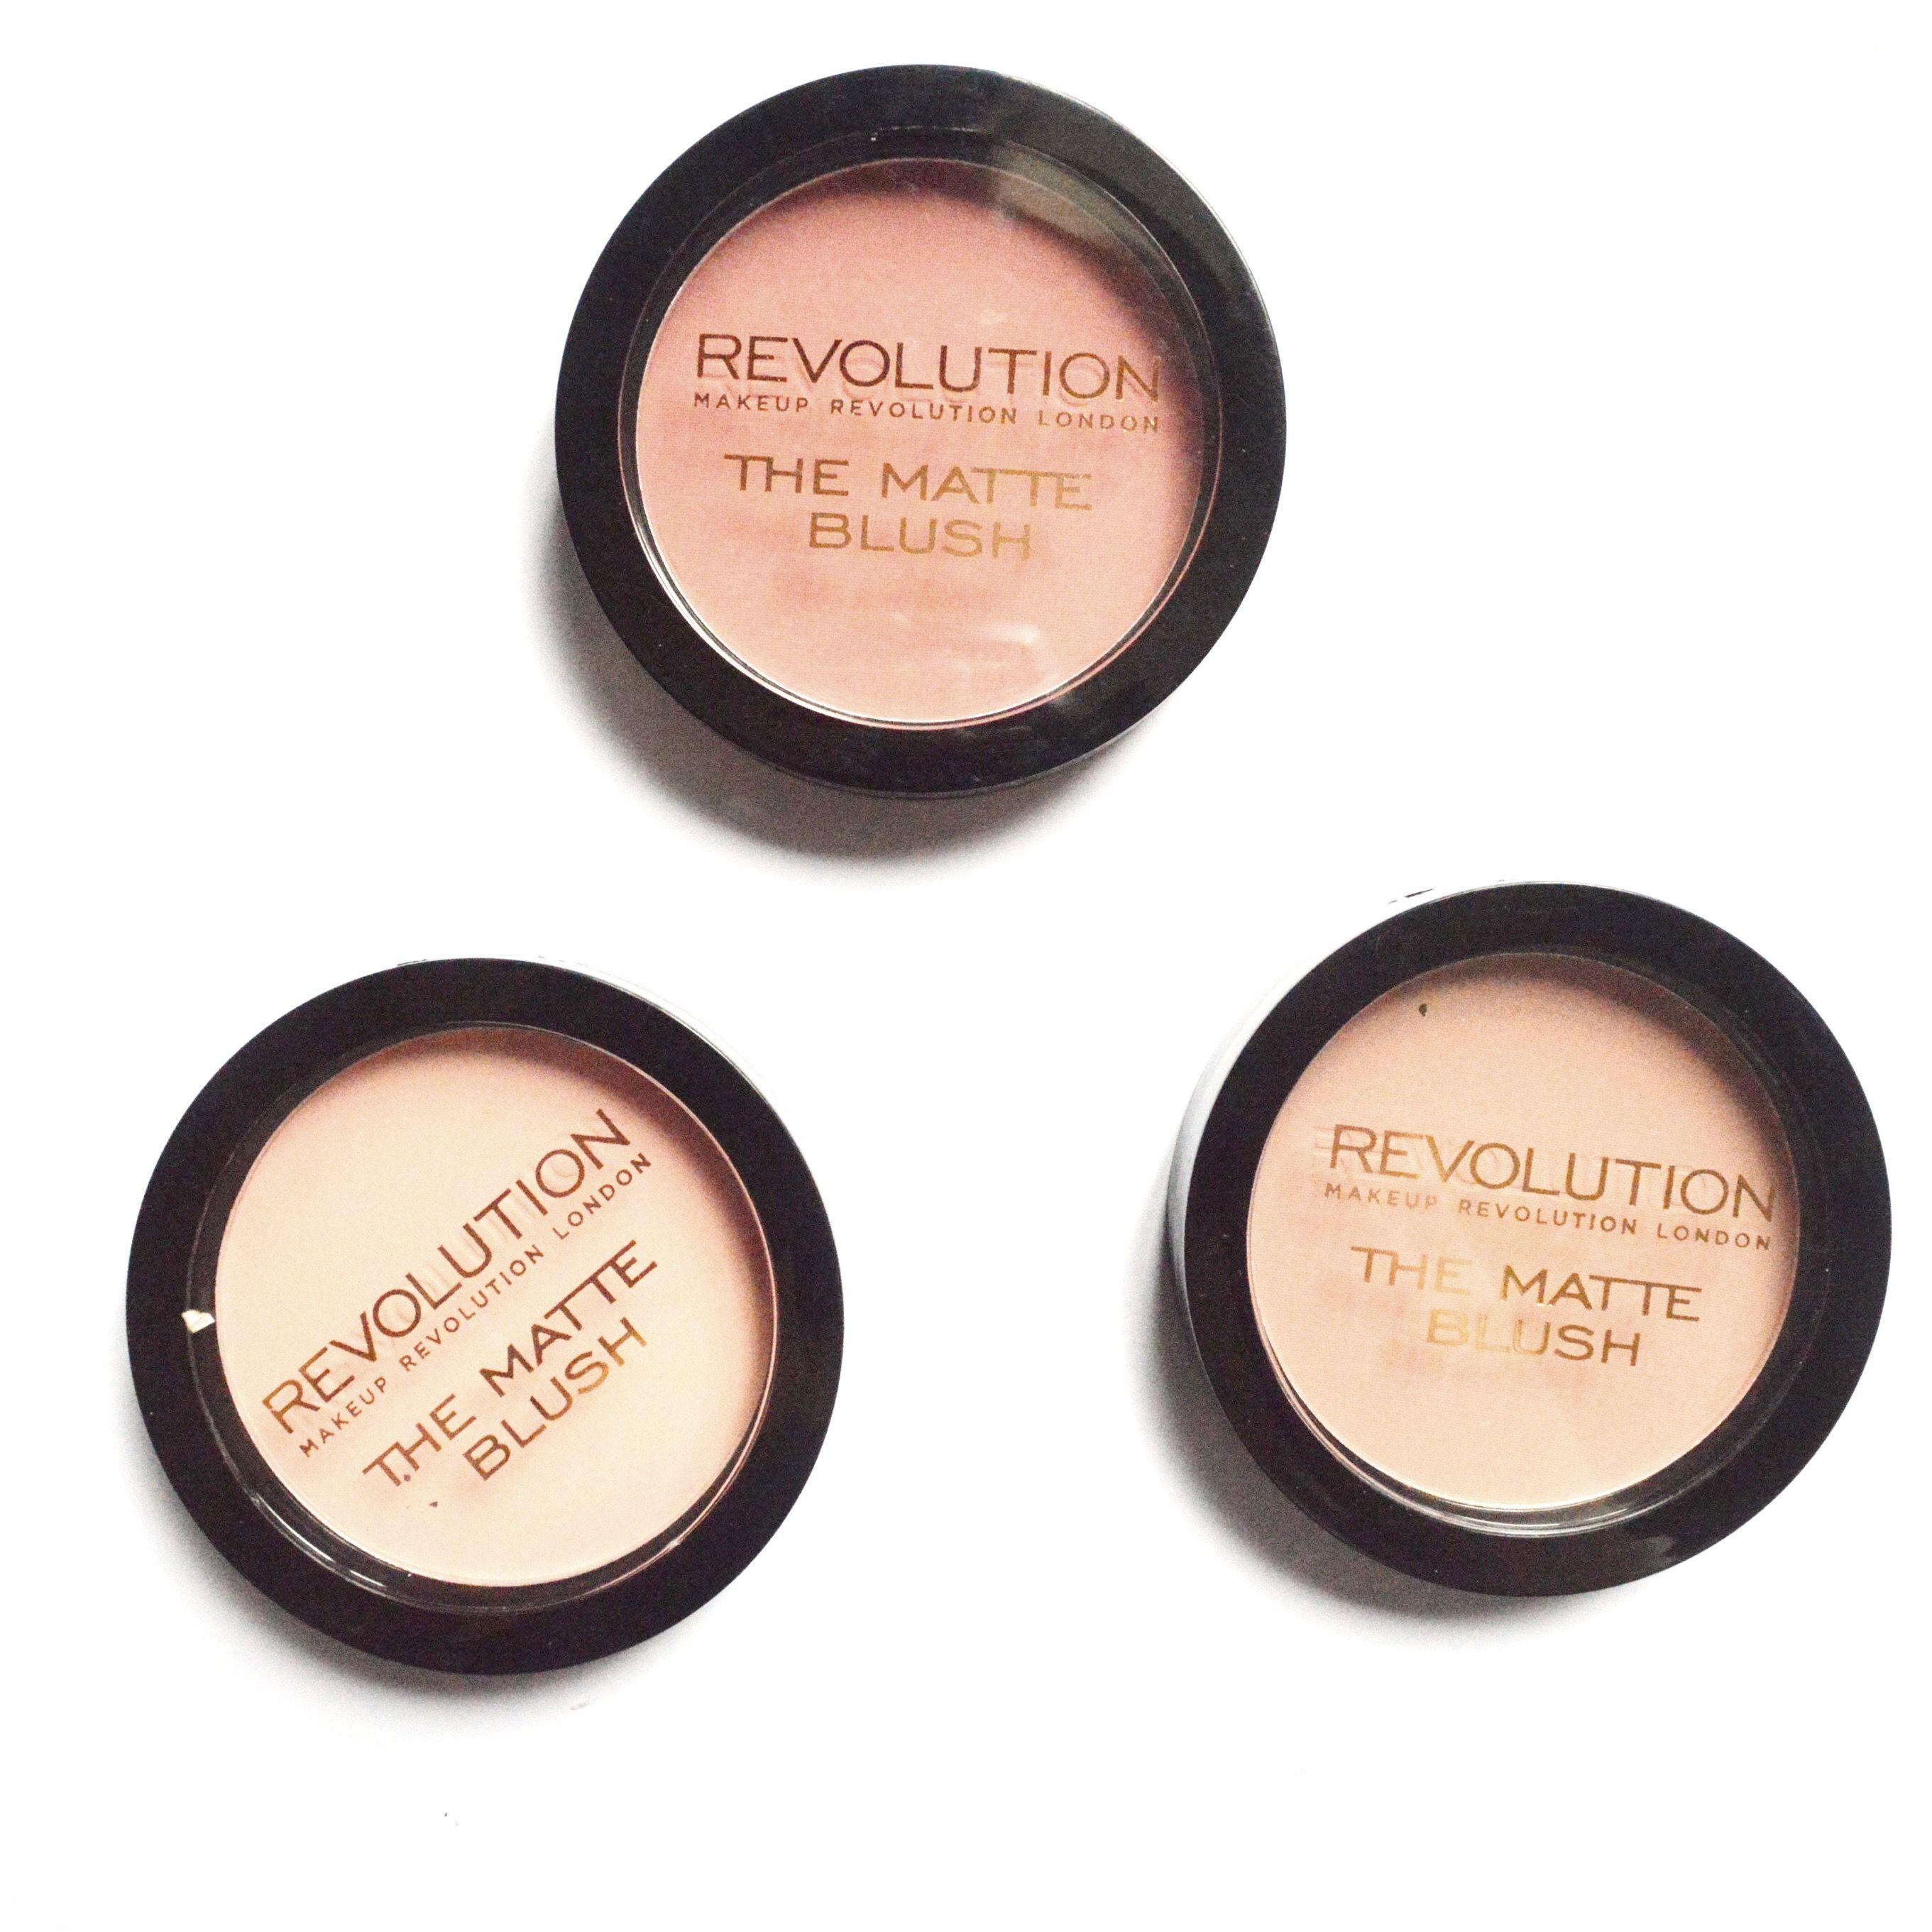 Makeup Revolution blush review Blonde Any Makeup